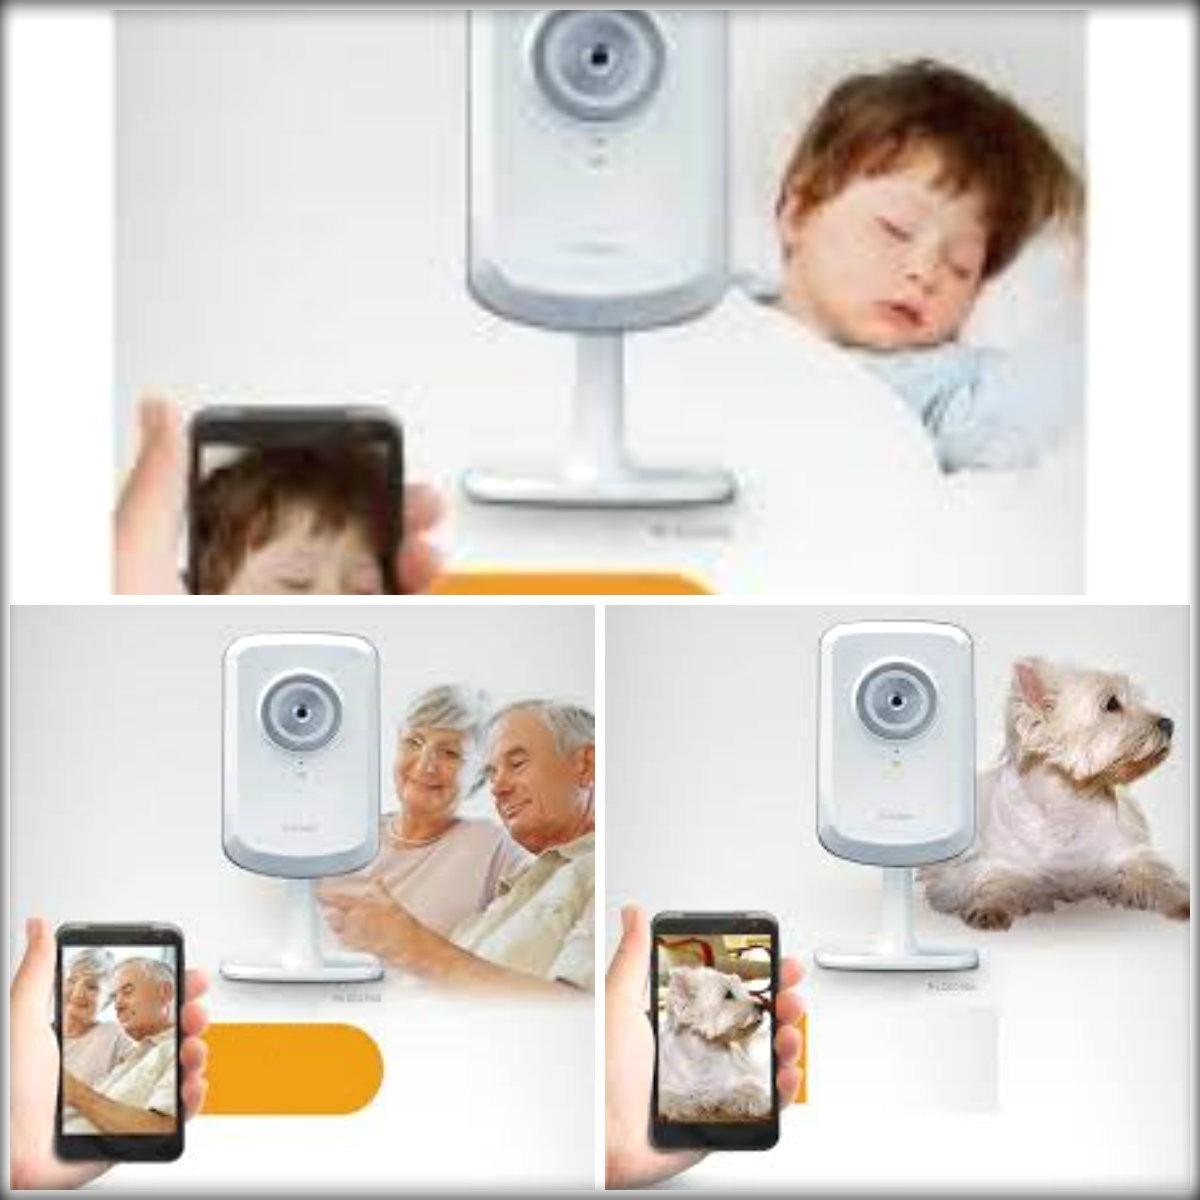 baby monitor c mera ip com acesso via iphone ipad android r 225 00 em mercado livre. Black Bedroom Furniture Sets. Home Design Ideas